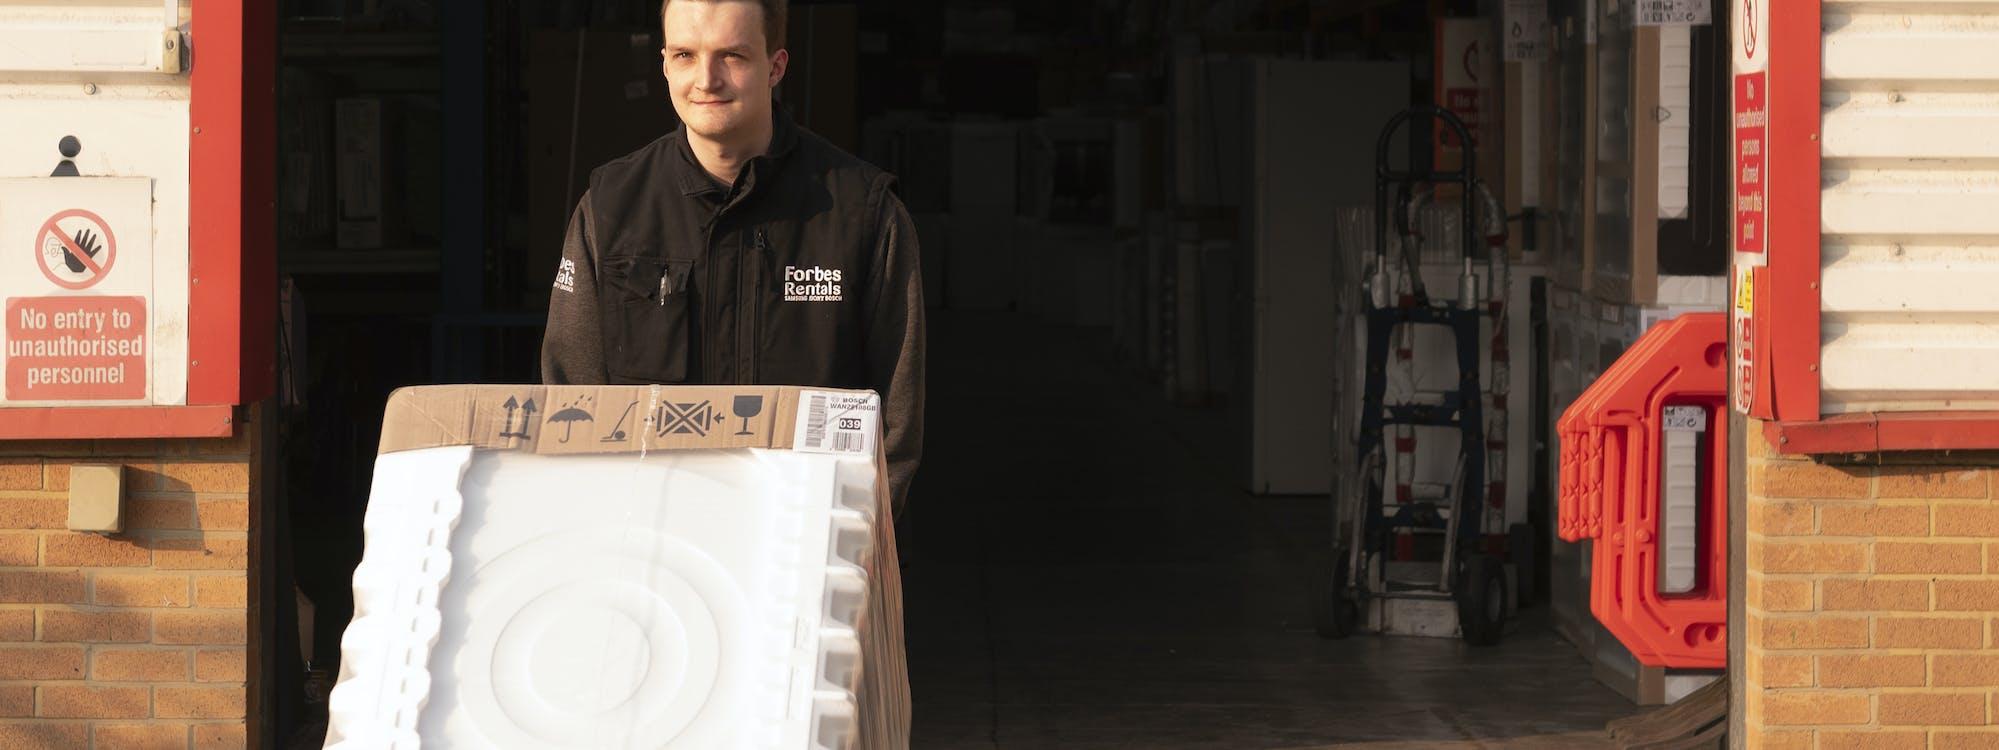 Forbes Professional Warehouse Employee Pushing Washing Machine